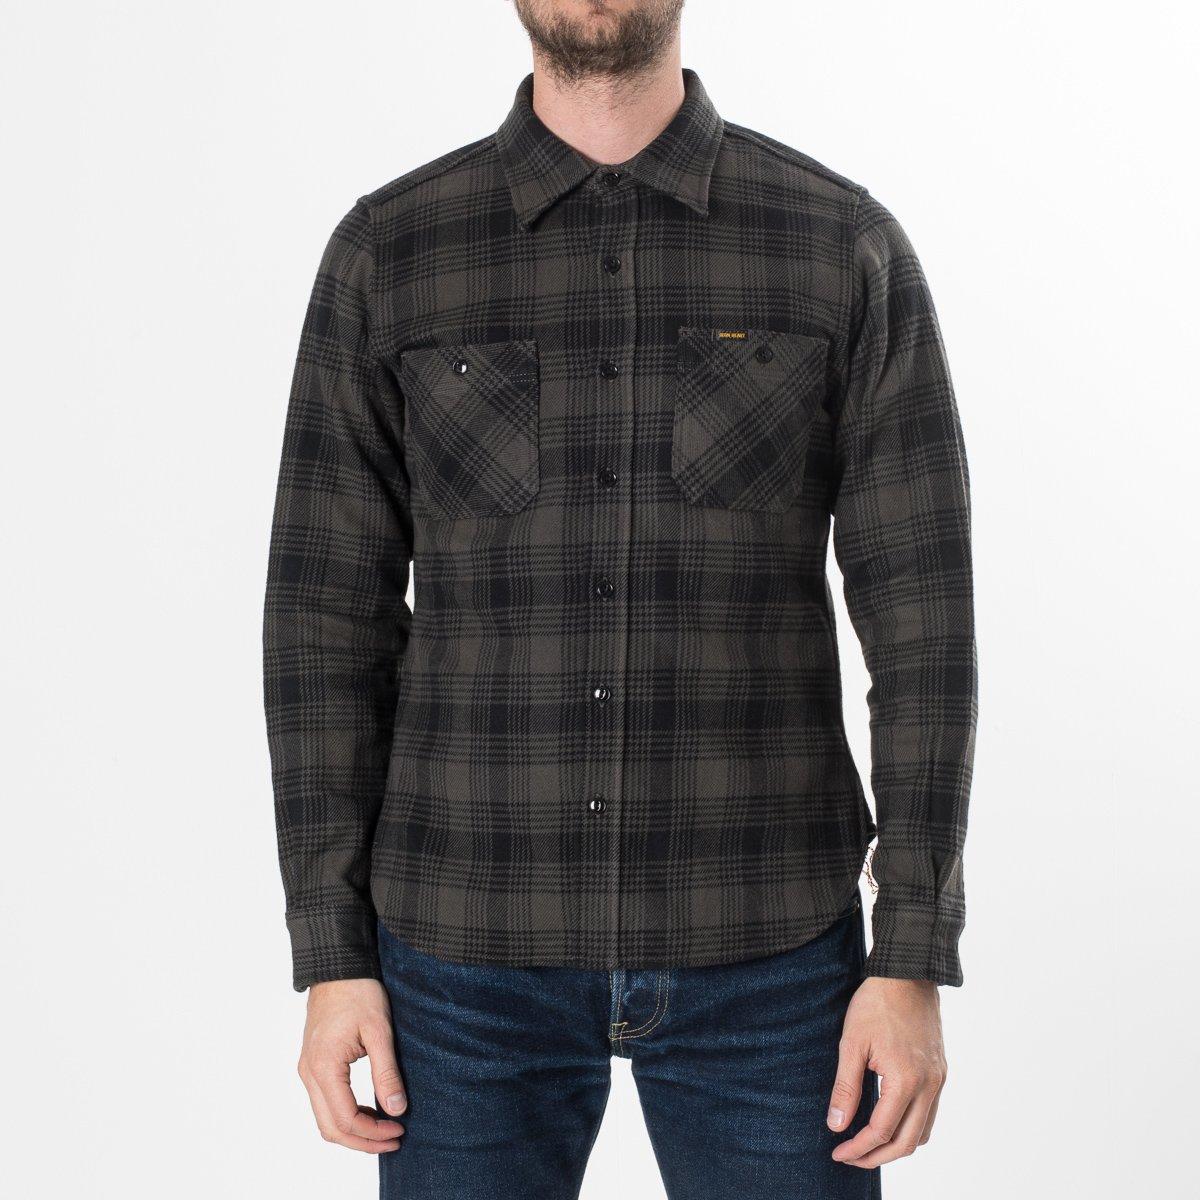 Ihsh 190 Gry Iron Heart Ultra Heavy Japanese Cotton Flannel Grey Glen Plaid Shirt Jacket Black Check Work